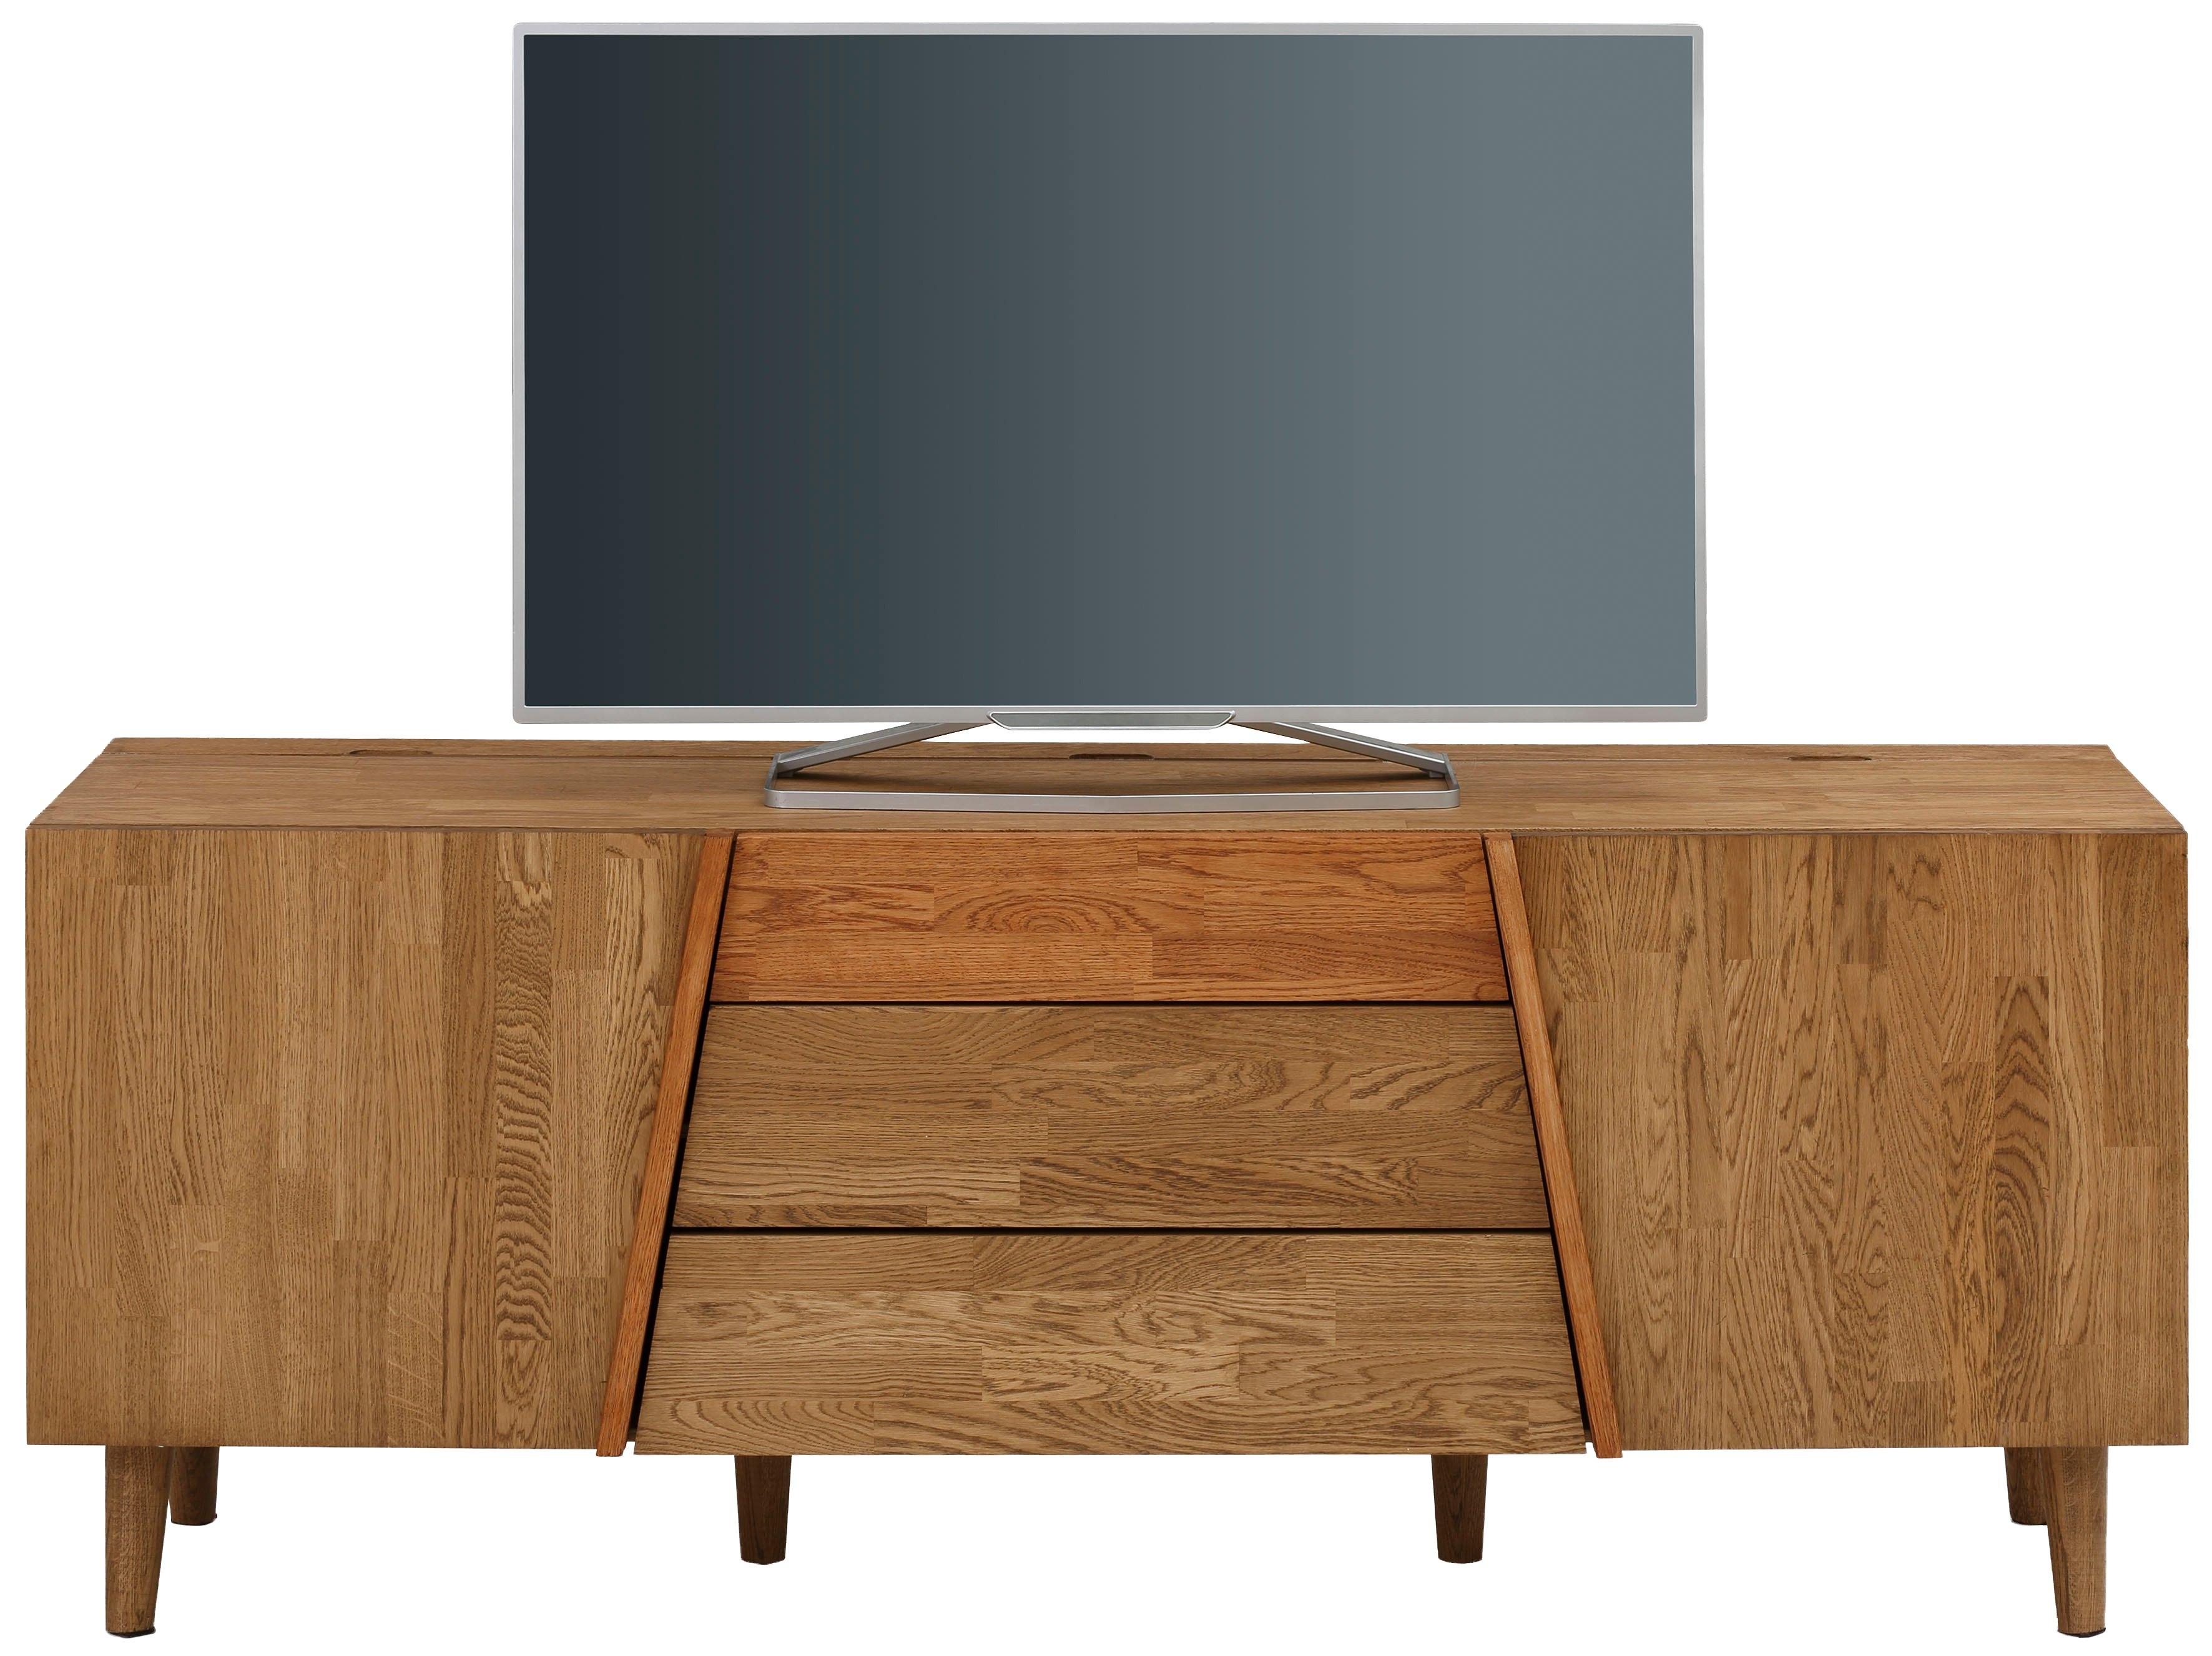 Premium collection by Home affaire tv-meubel »Ines« - verschillende betaalmethodes